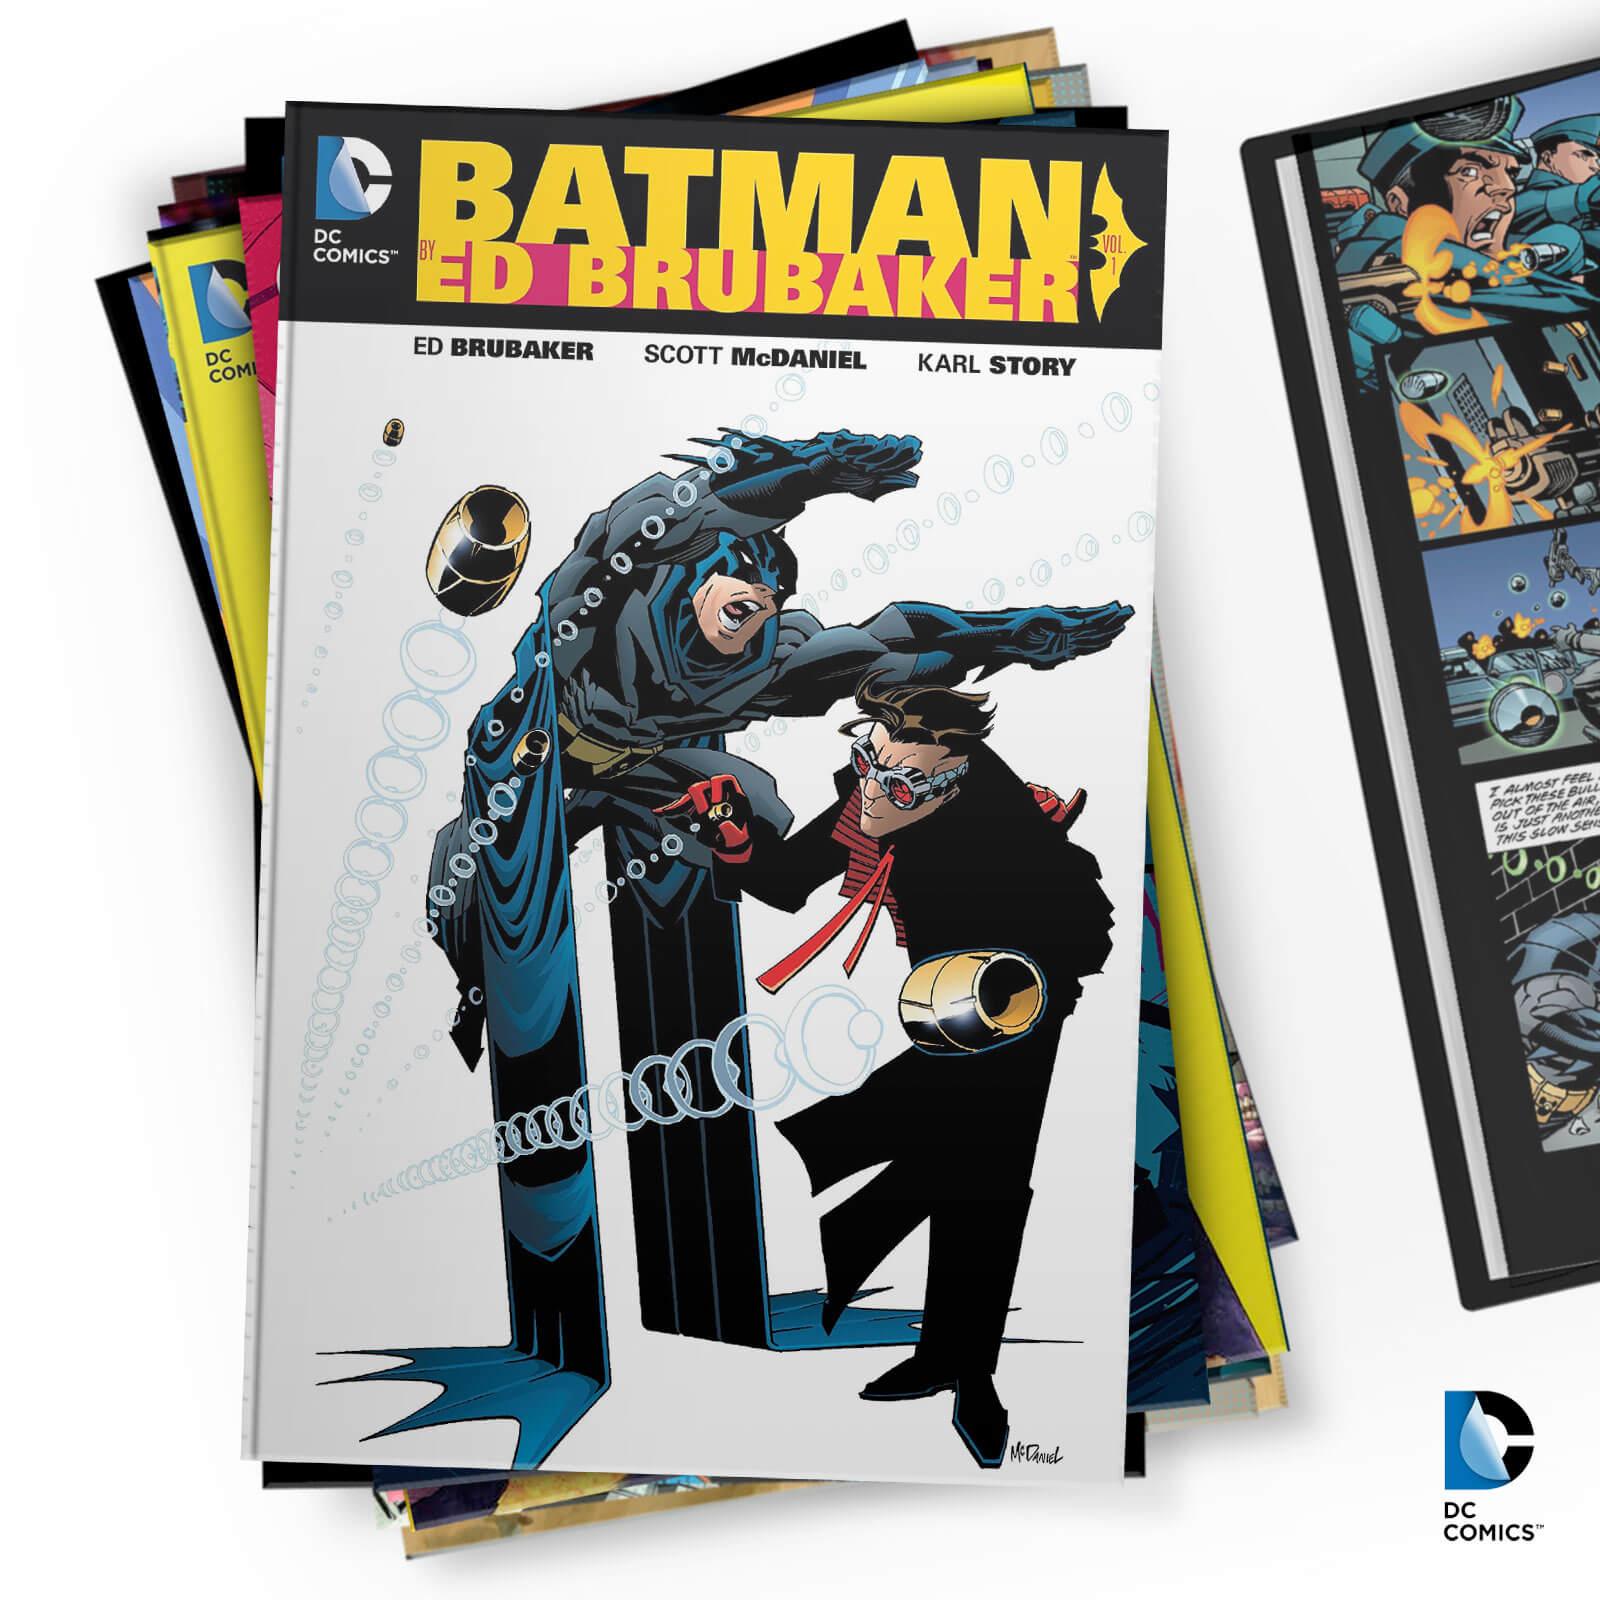 10 mystery DC comics (Engelstalig) voor €22,99 @ Zavvi.nl